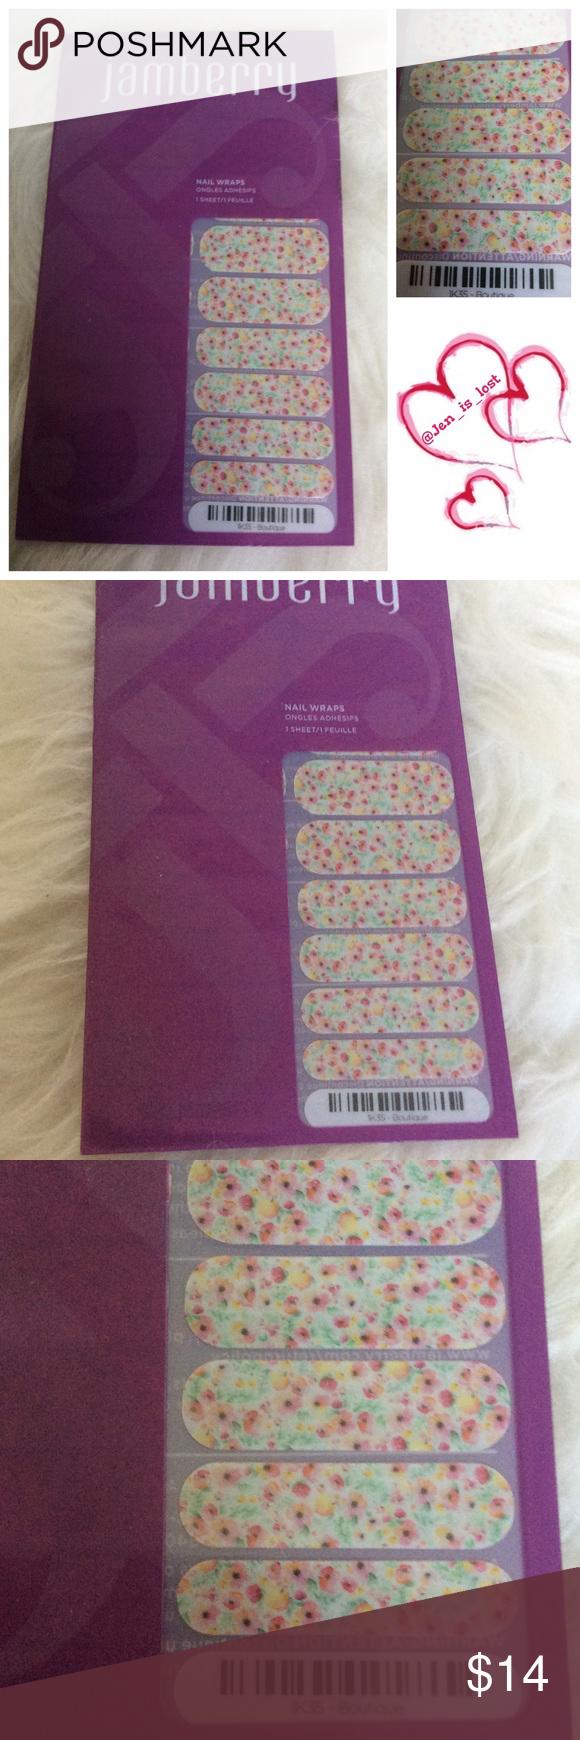 Jamberry Nail Wraps Boutique 1 Sheet Jamberry Nail Wraps Boutique 1 Sheet Jamberry Accessories